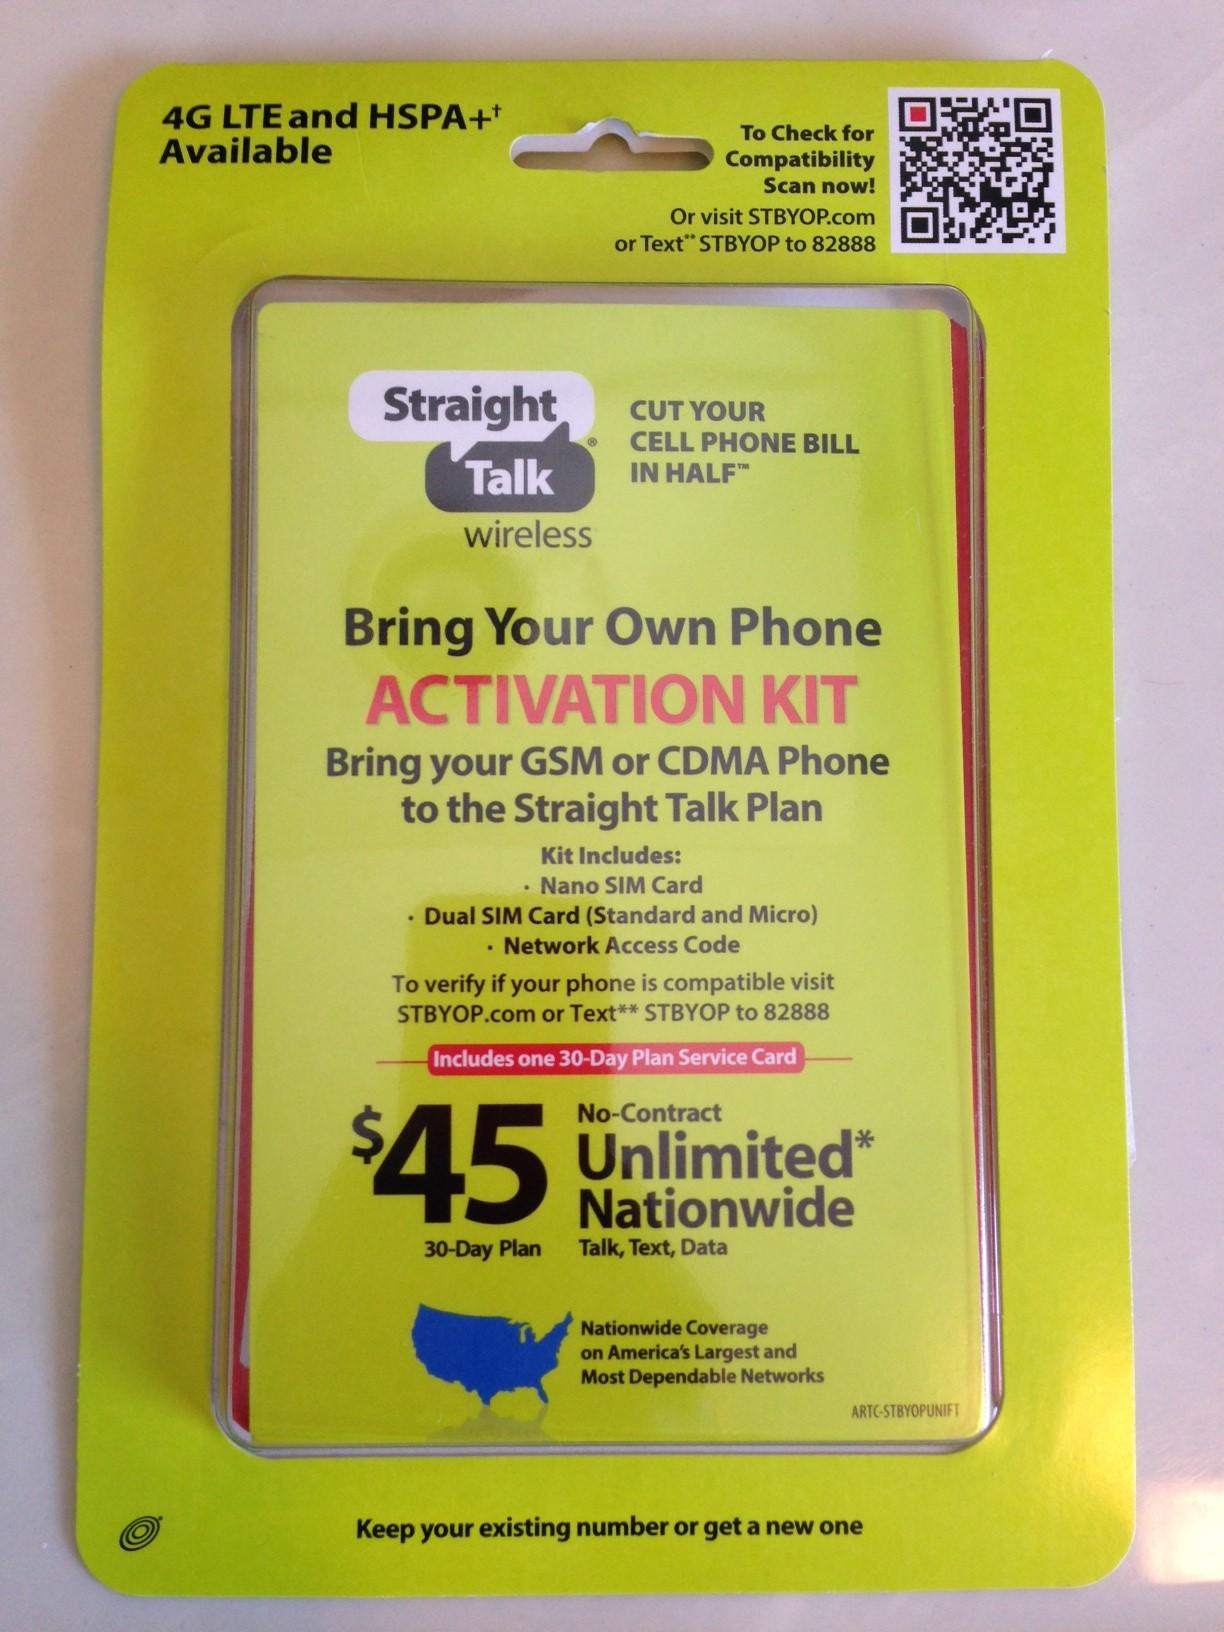 Straight Talk vs Cricket Wireless: two prepaid plans that